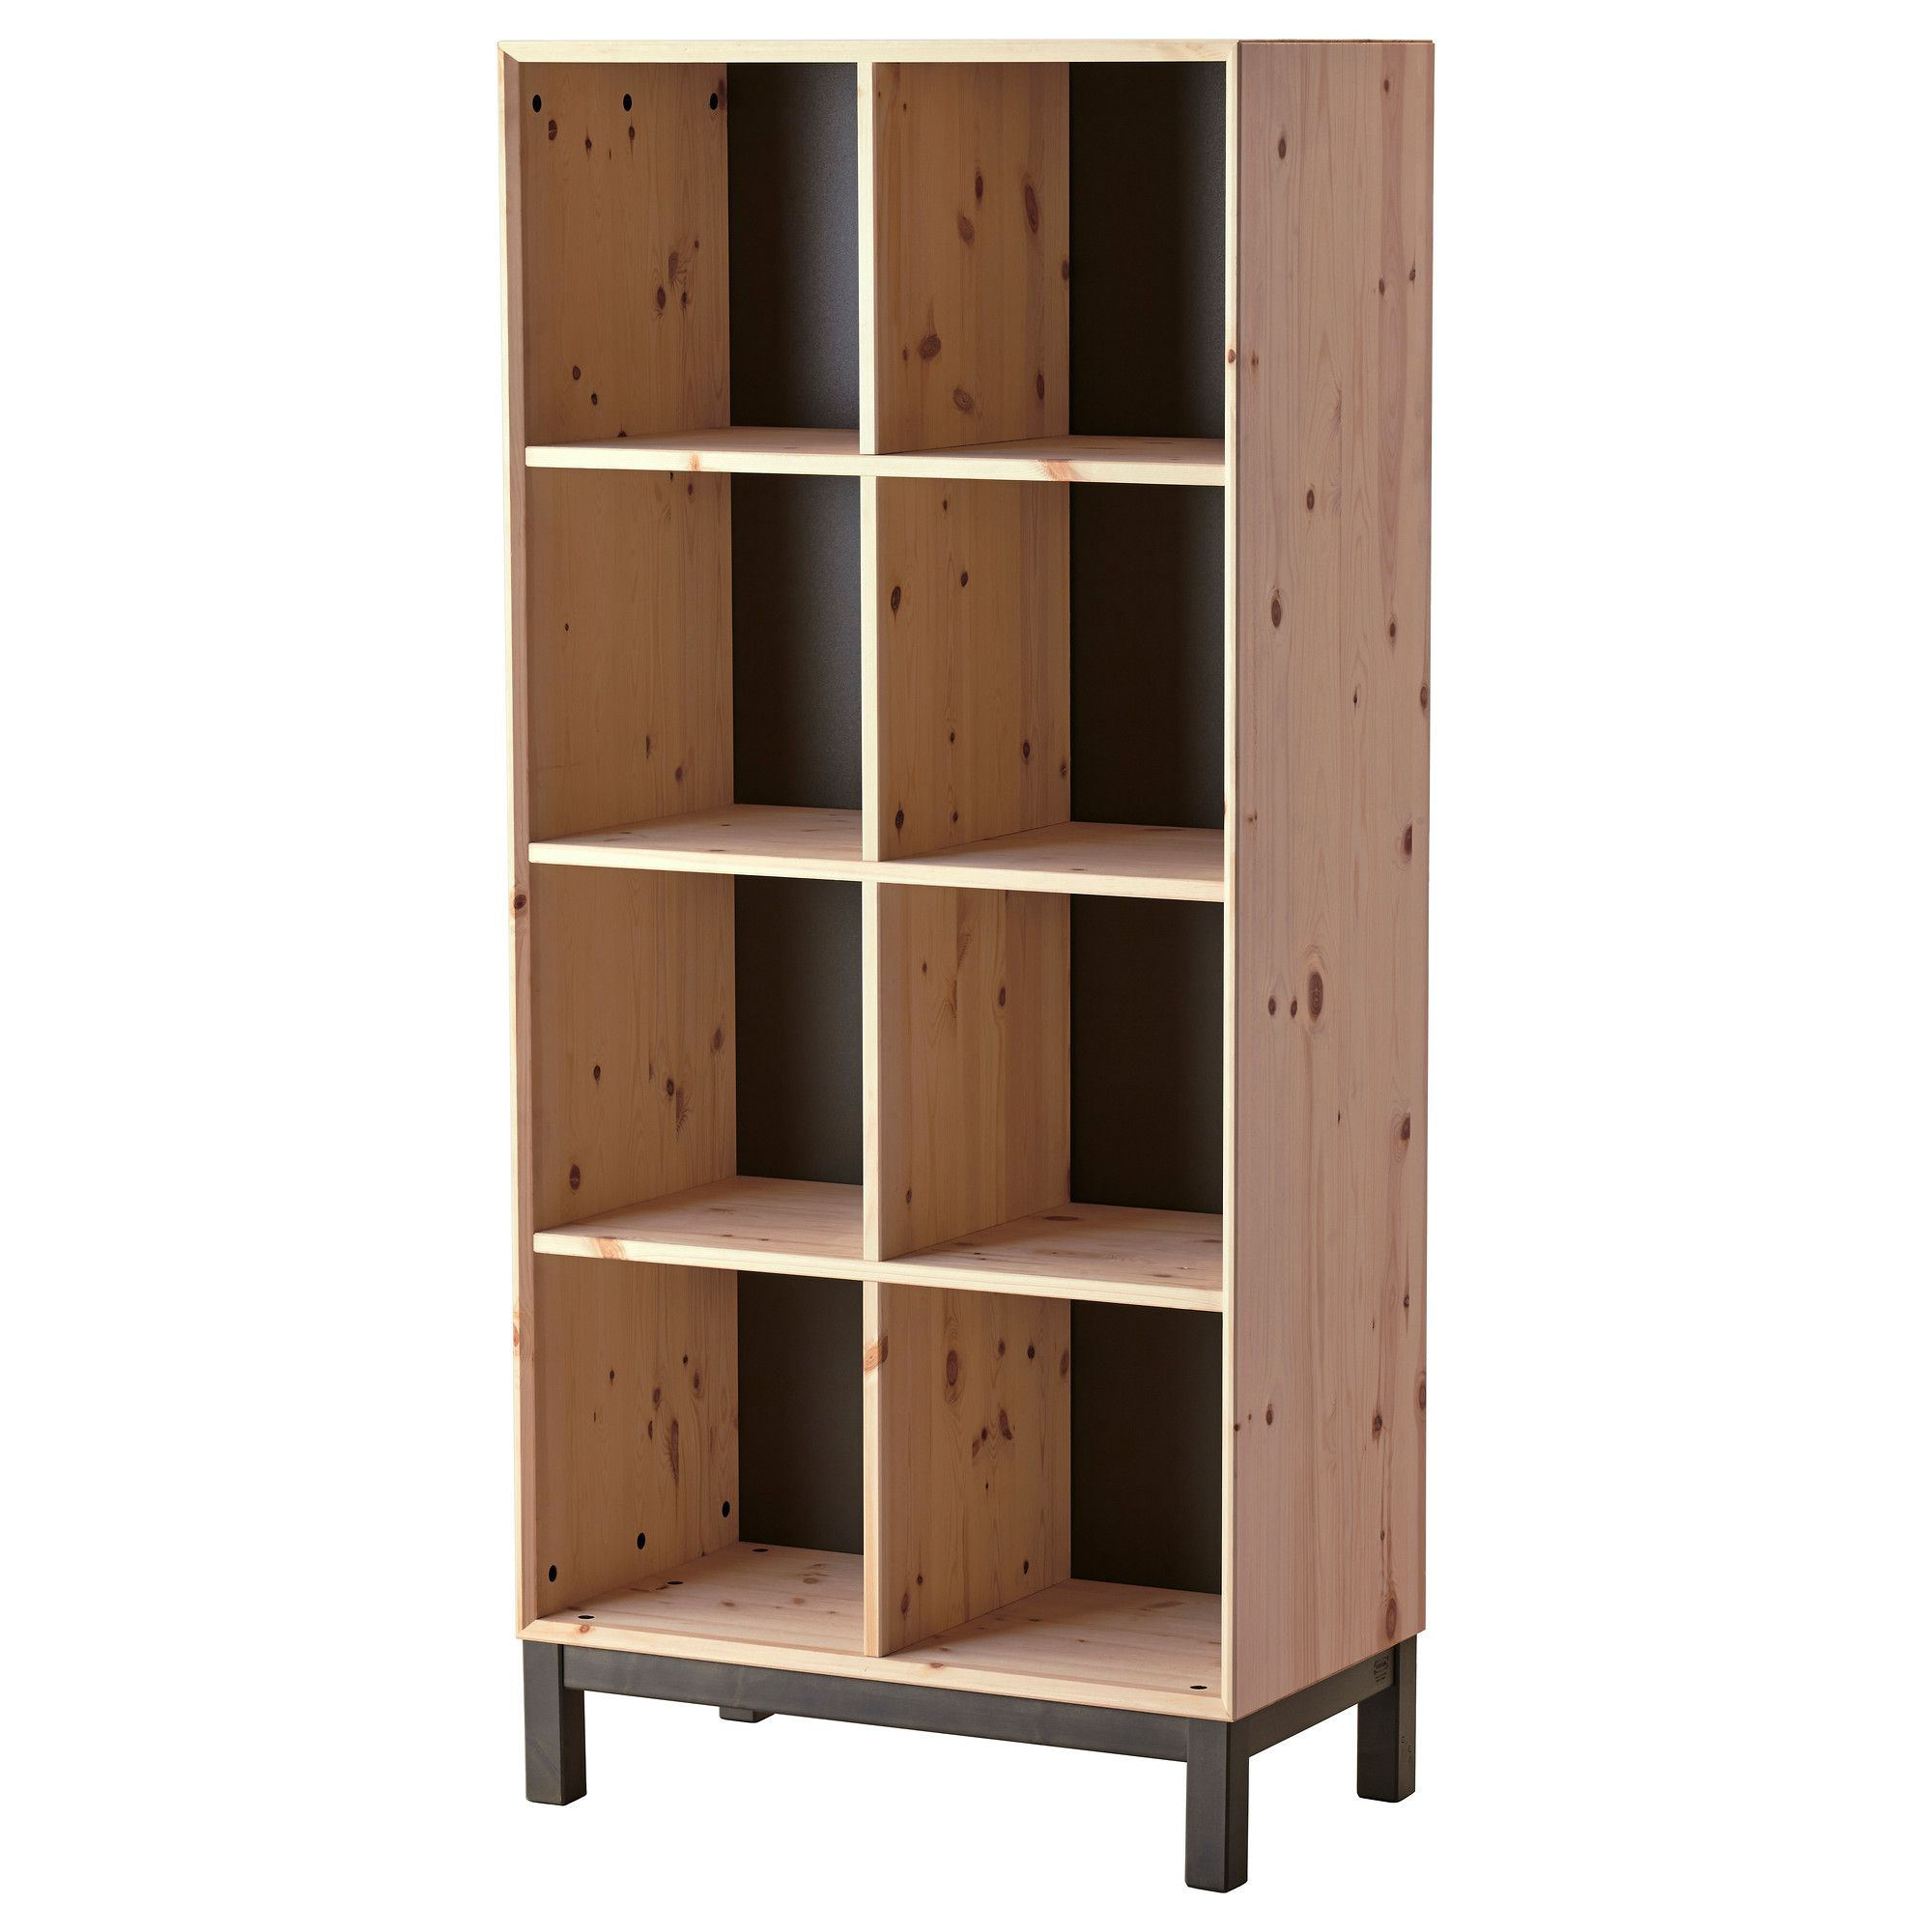 ikea norn s biblioth que le pin massif non trait. Black Bedroom Furniture Sets. Home Design Ideas